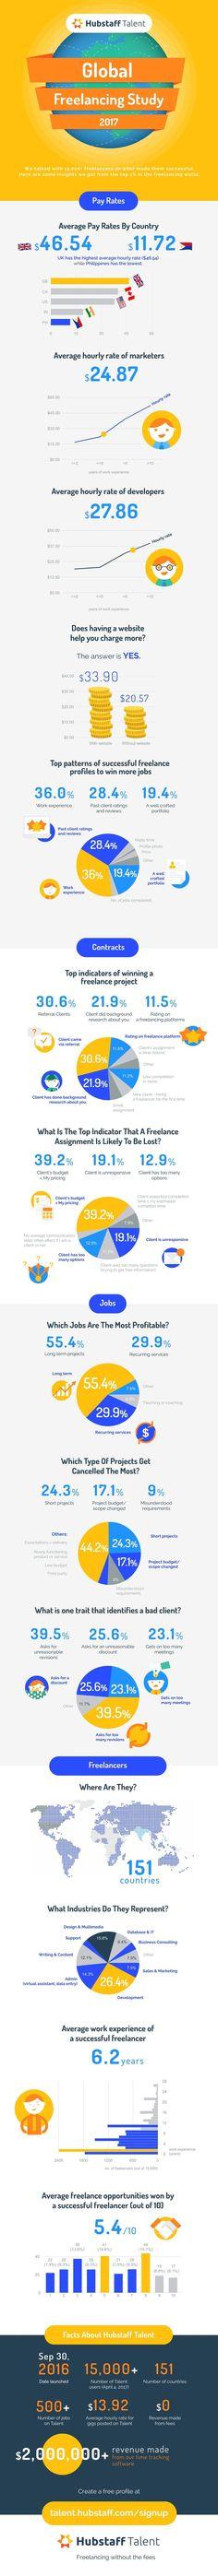 Albert Einstein\u0027s resume infographic Infographic Visual Resumes - resume 7 eleven